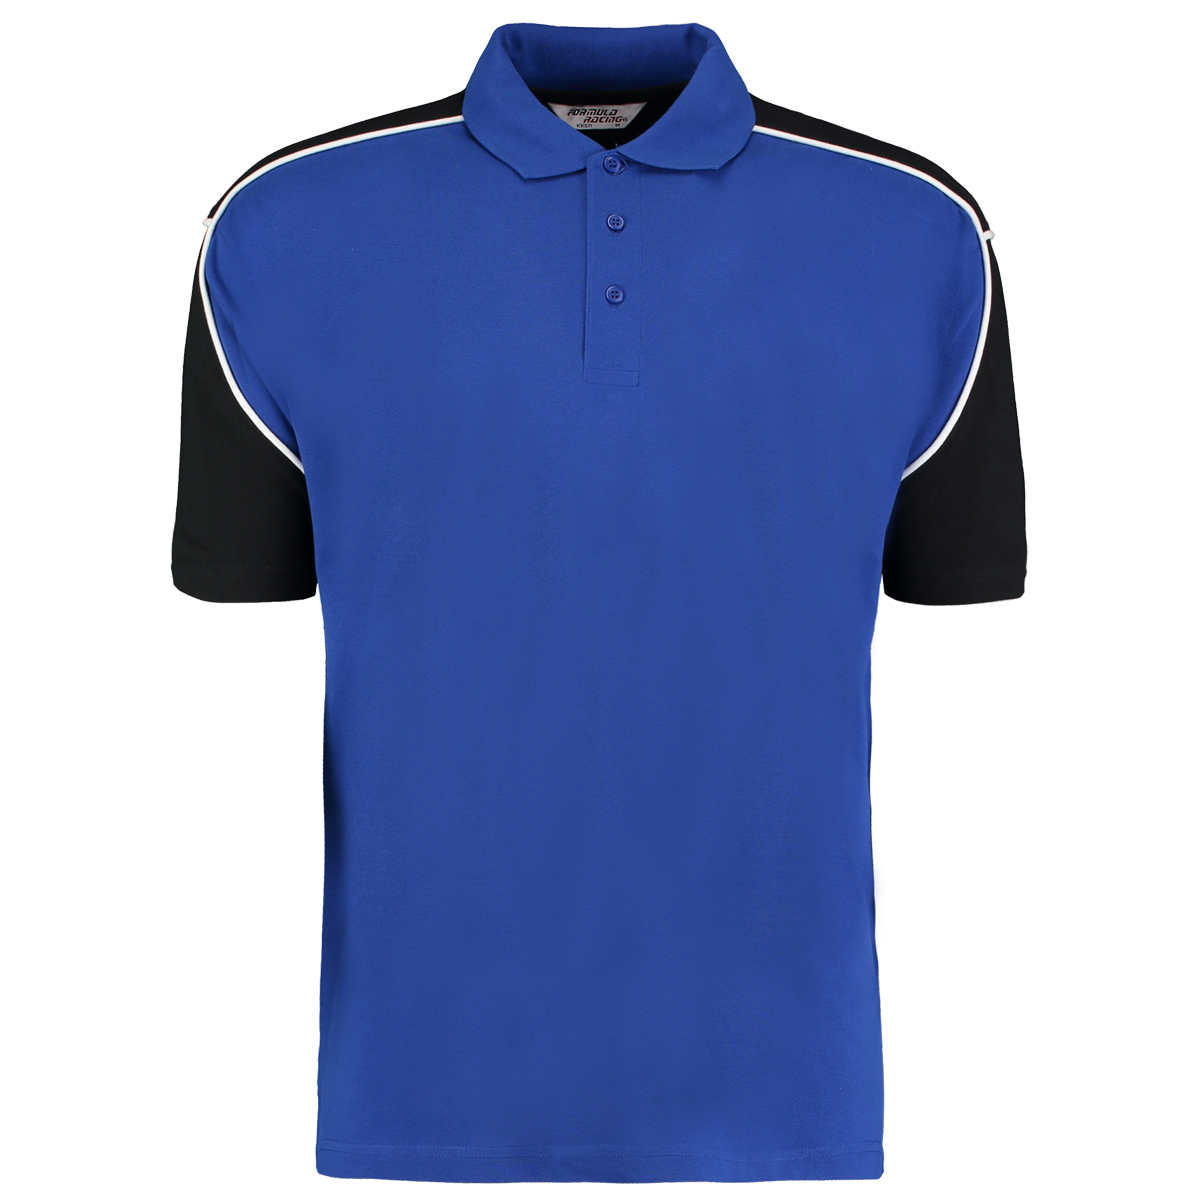 Royal Blue Polo Shirt For Men